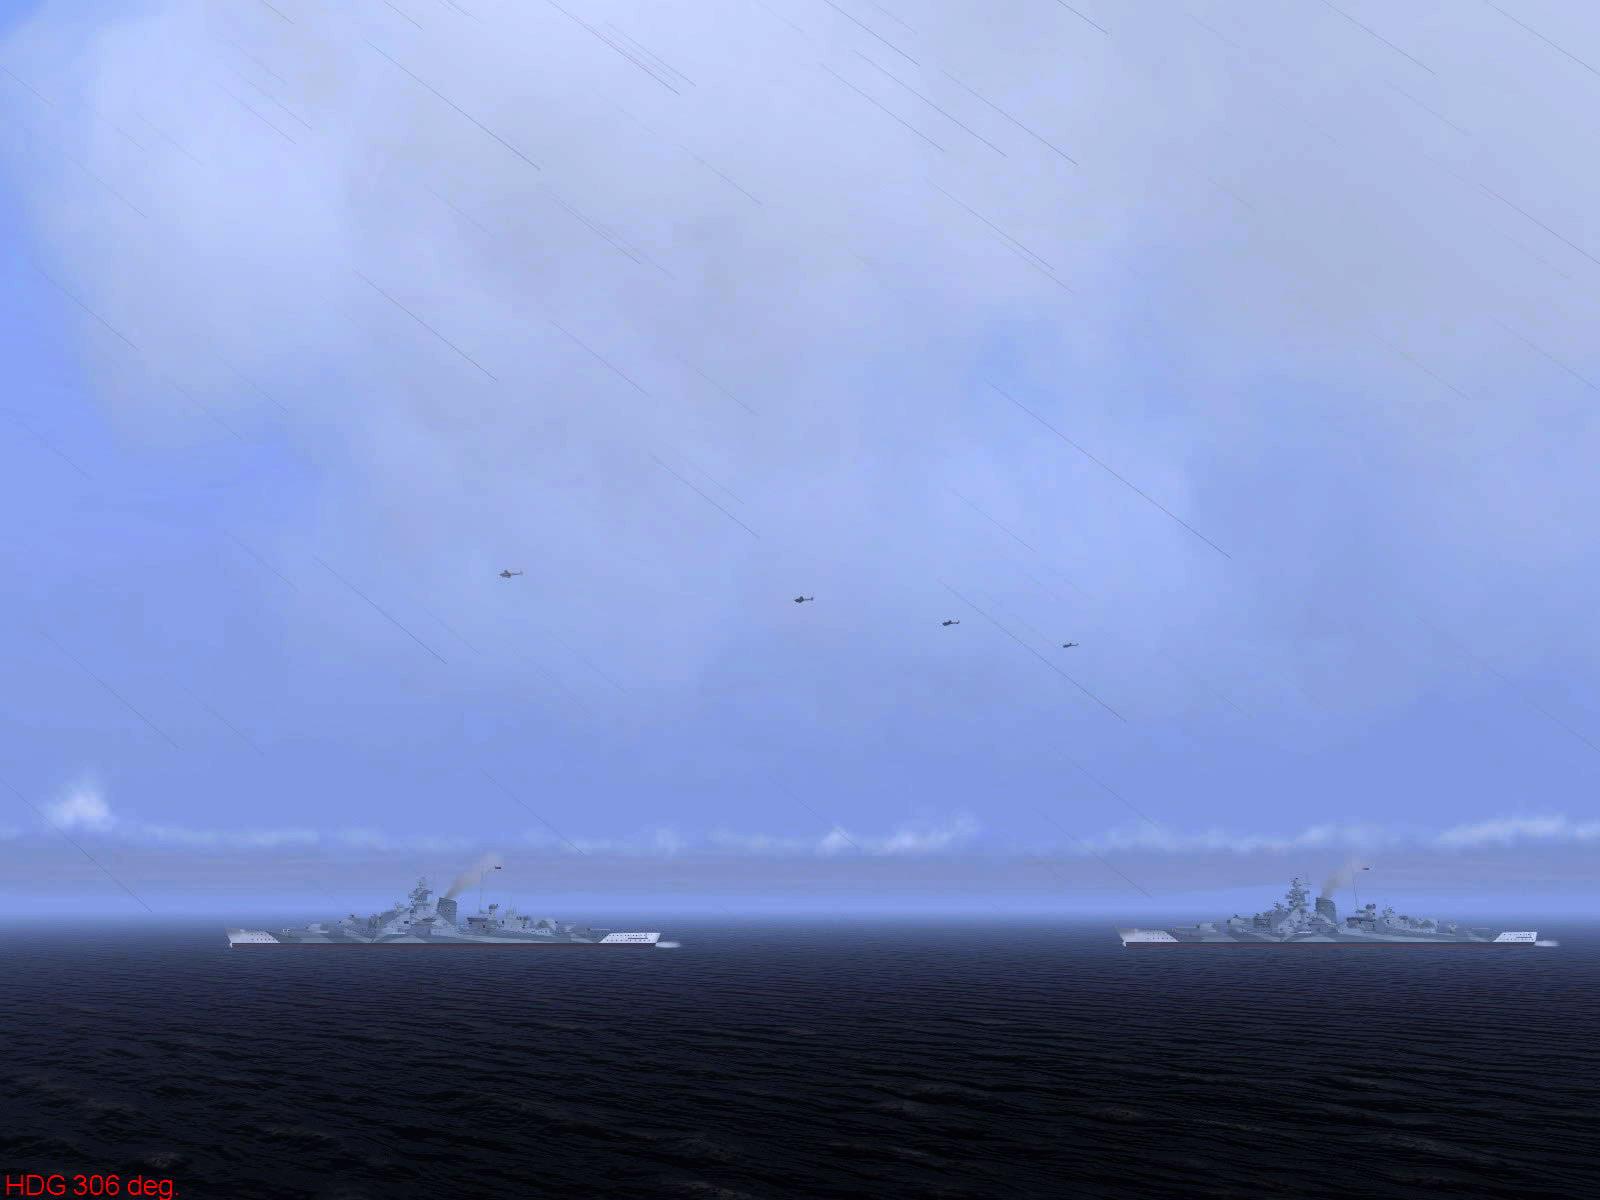 Ubisoft IL2 Sturmovik game version of Operation Donnerkeil 01